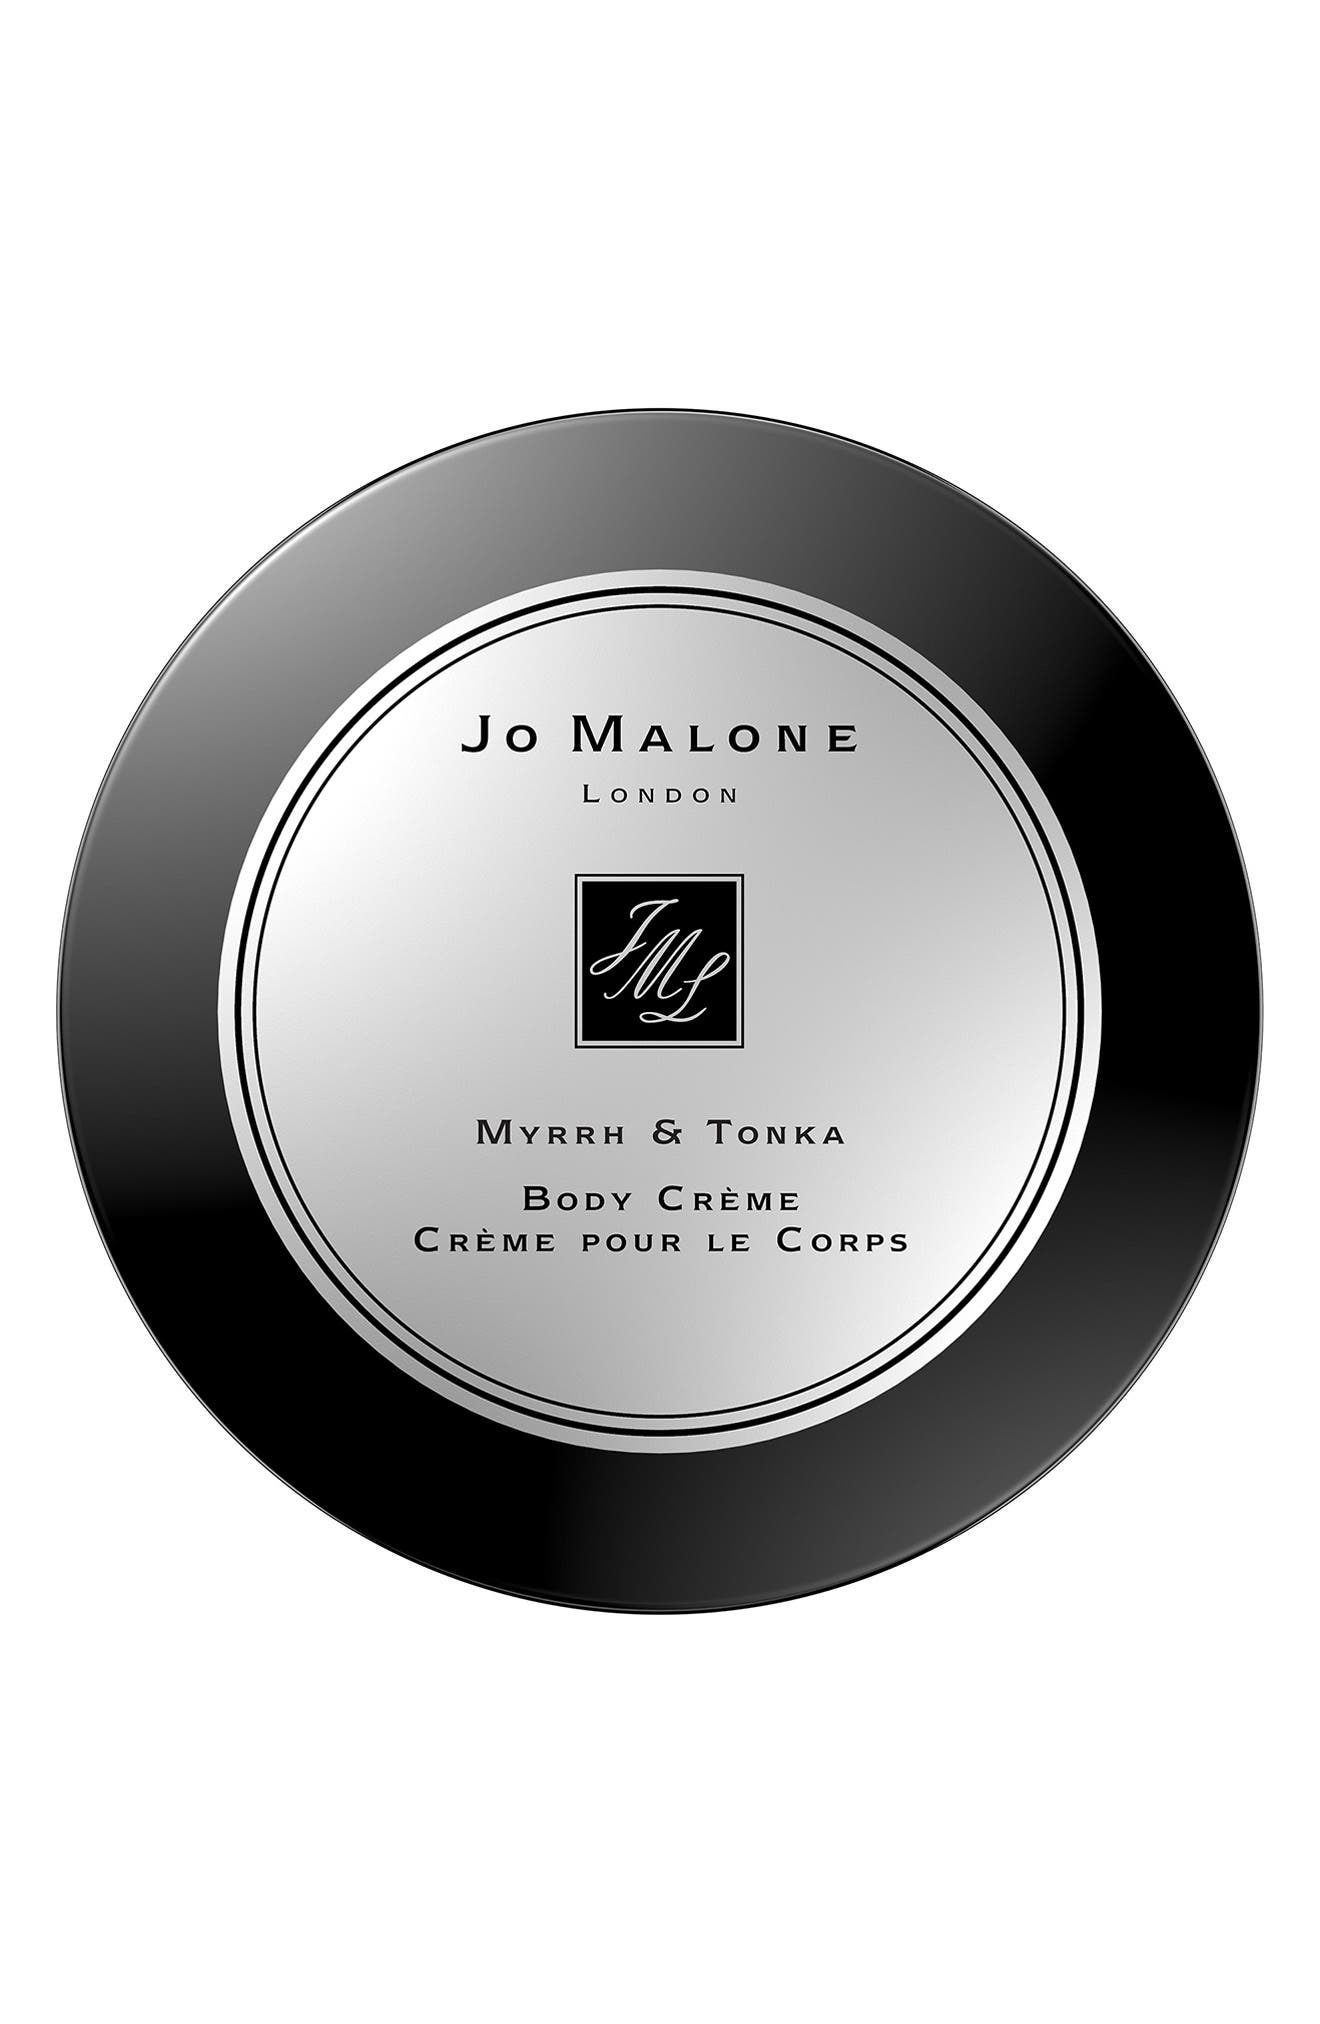 Jo Malone London(TM) Myrrh & Tonka Body Creme